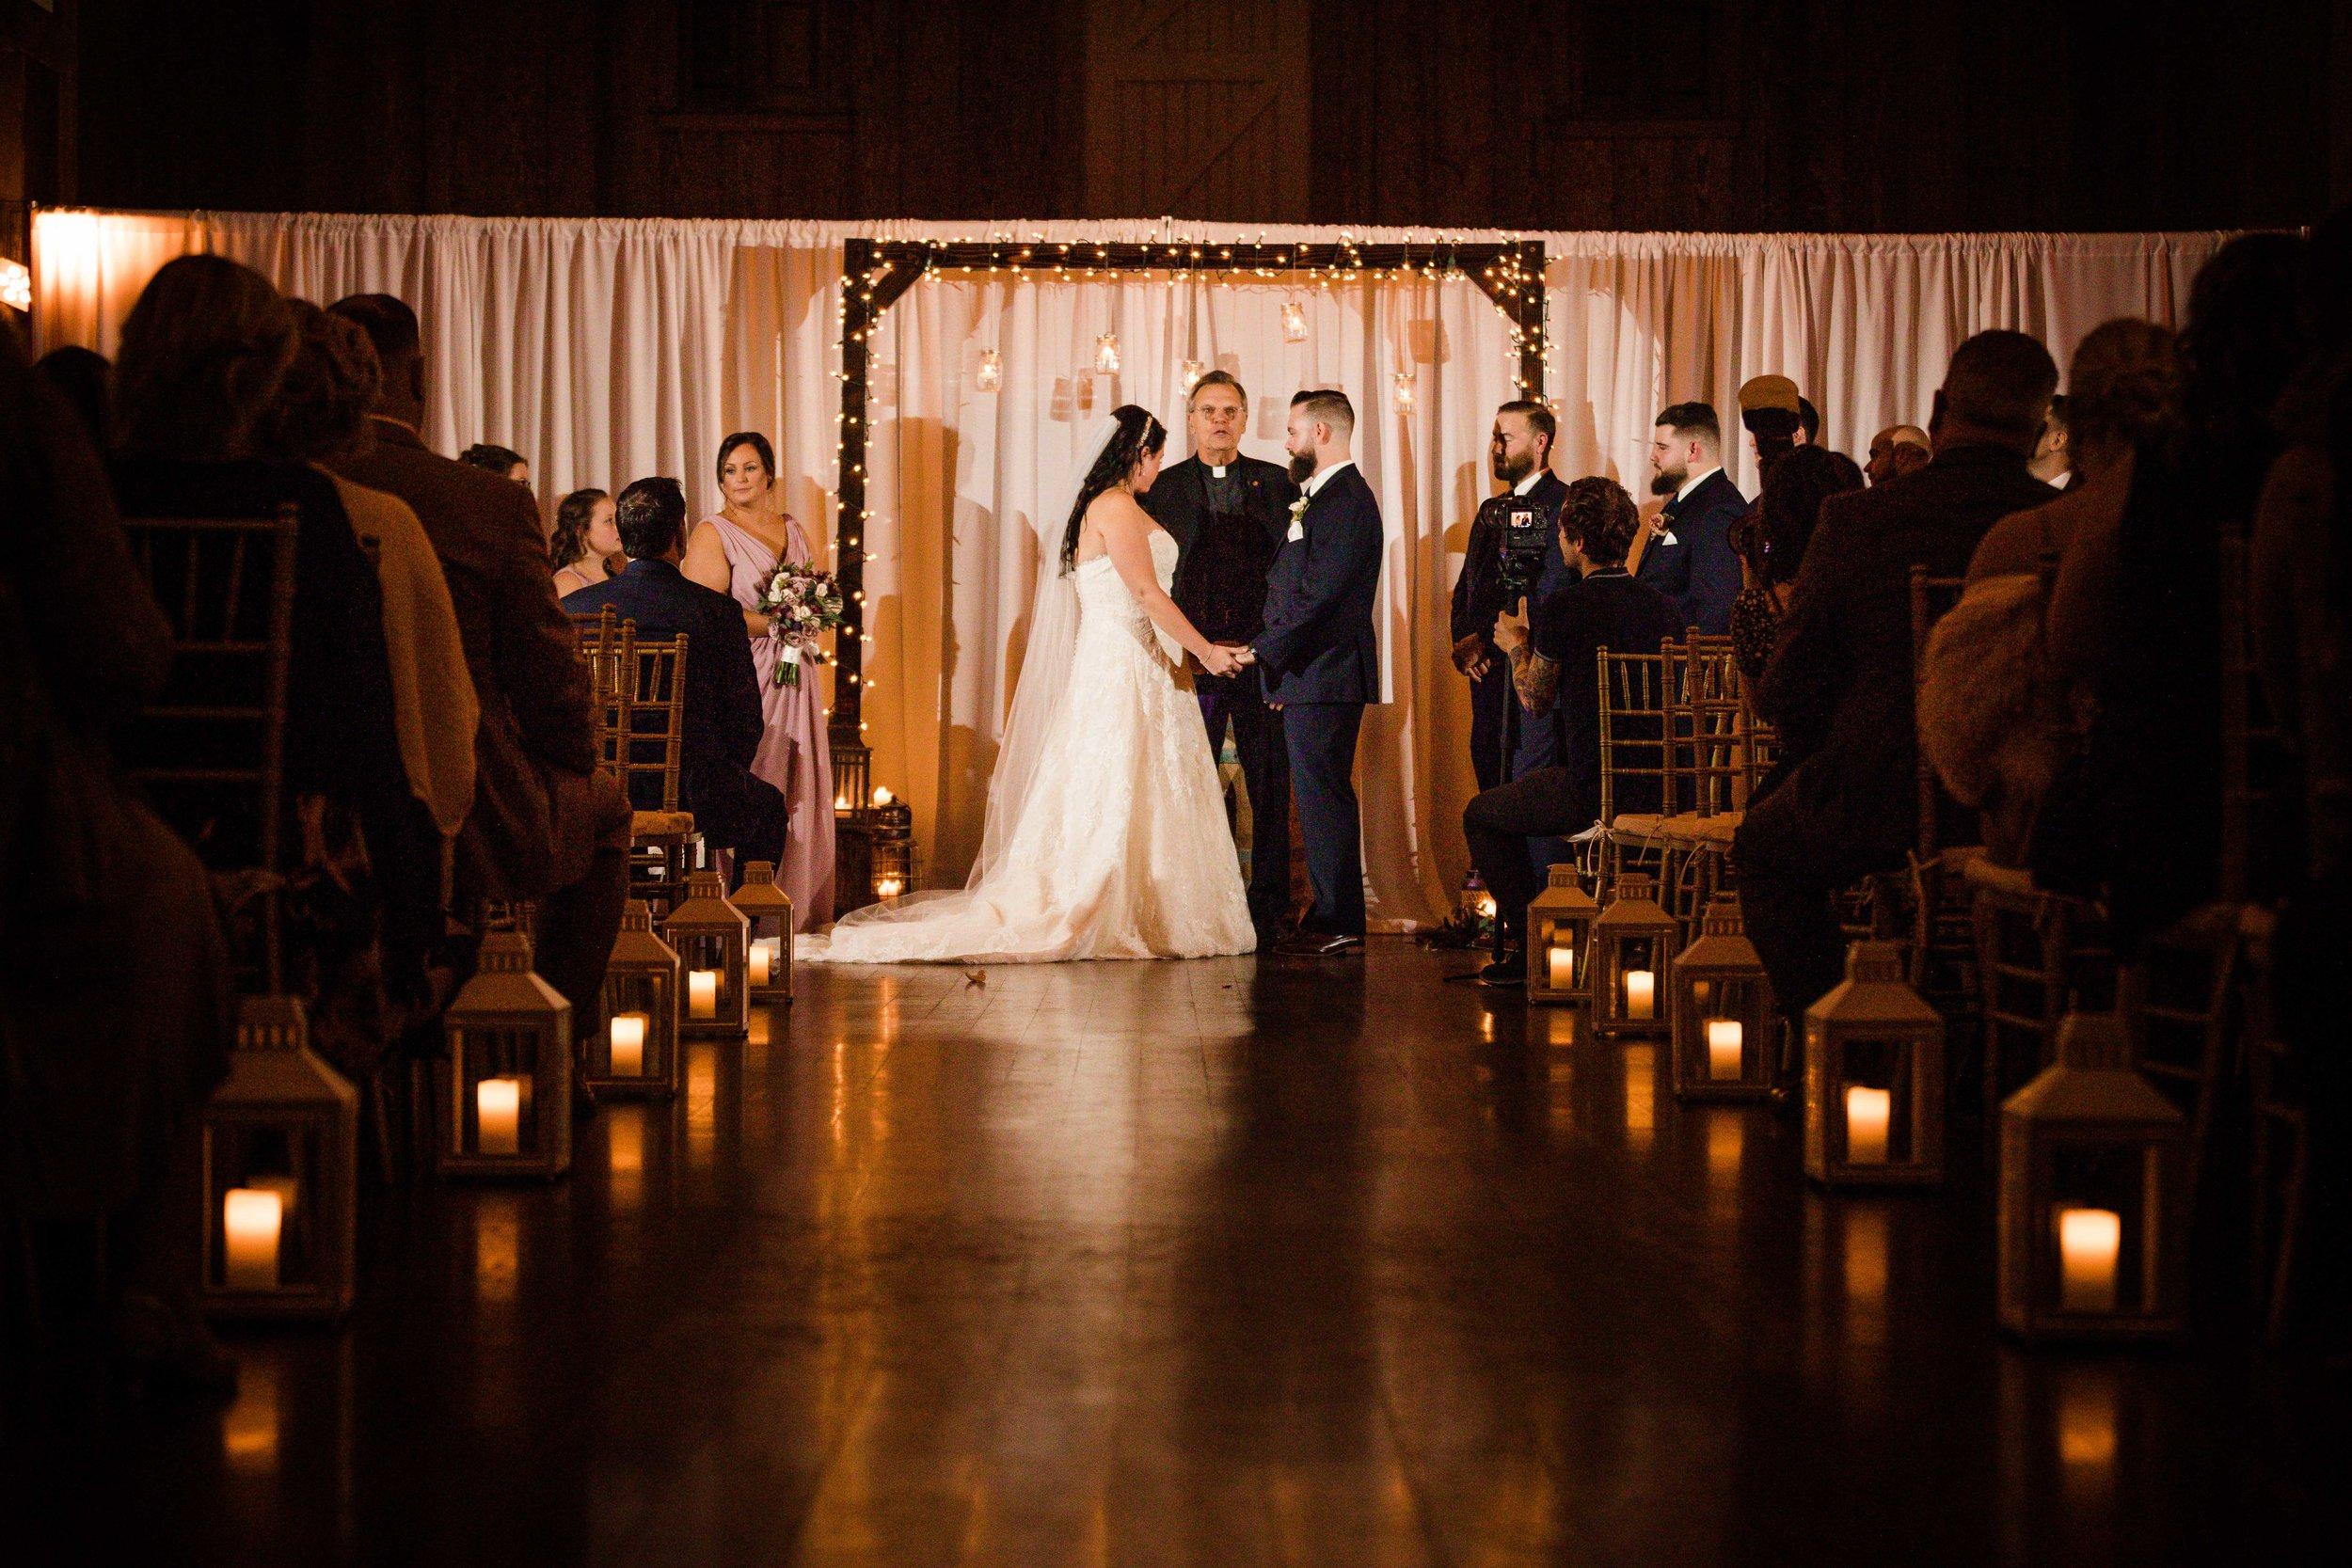 Diana and Henry - Normandy Farms Wedding Photography - Estras-102.jpg